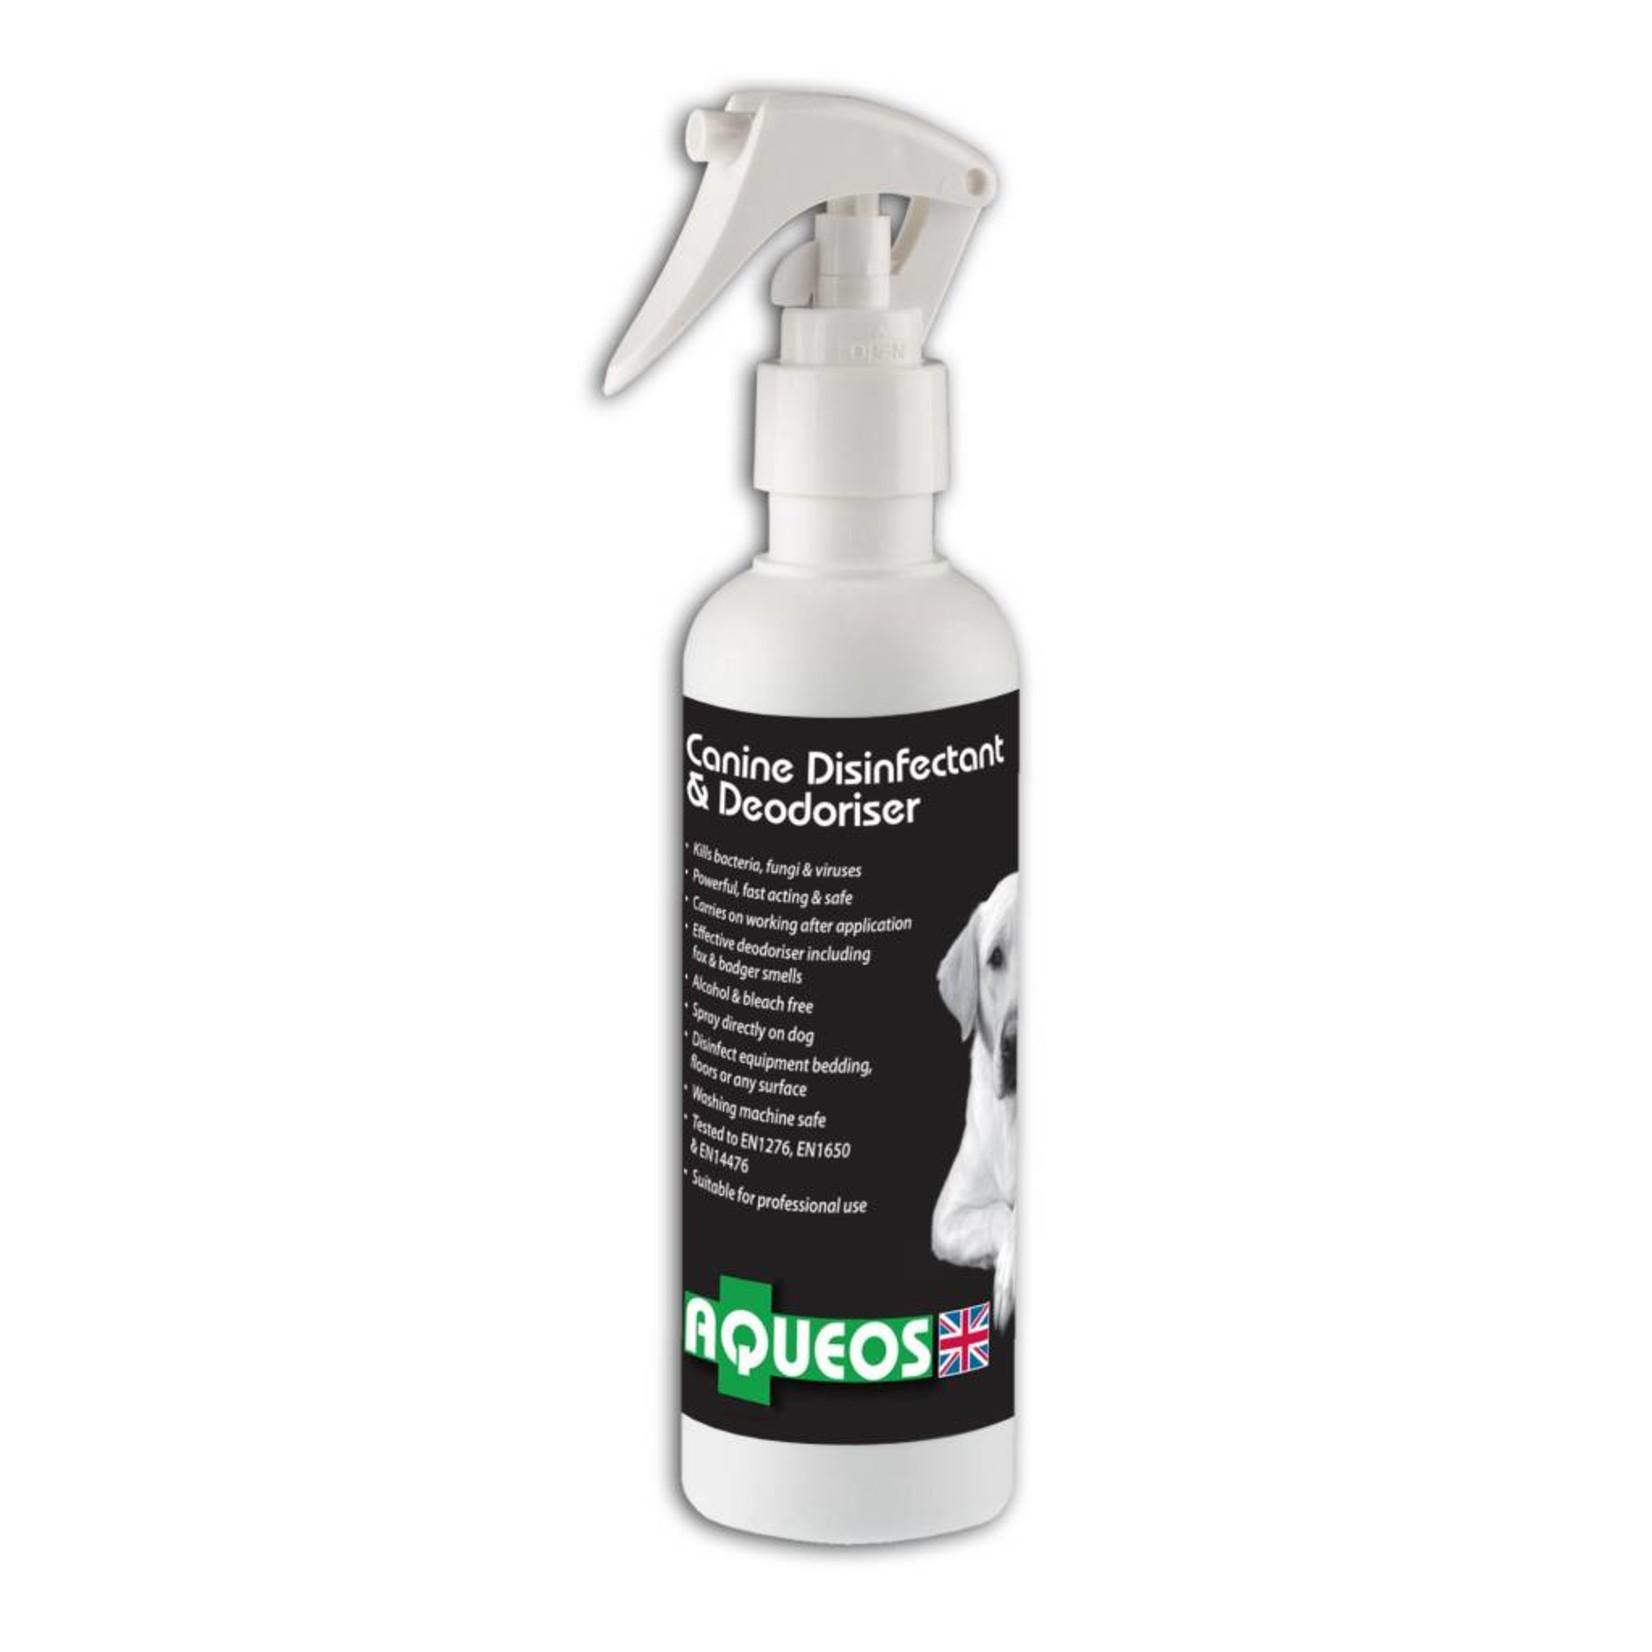 Aqueos Canine Disinfectant Deodoriser Spray Fragranced, 200ml